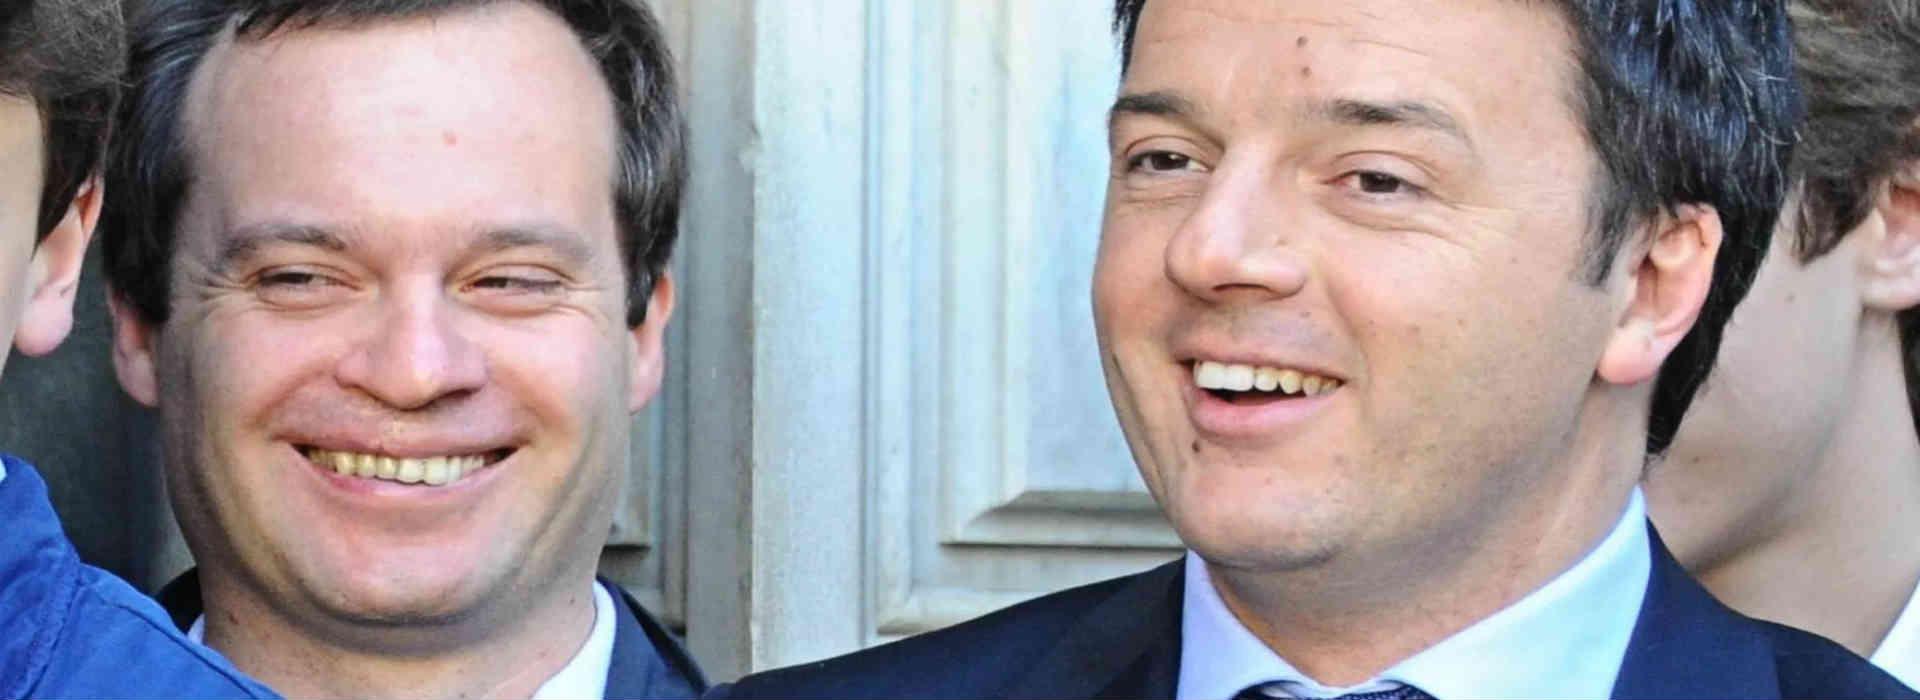 Matteo Renzi e Marco Carrai. Fondazione Open